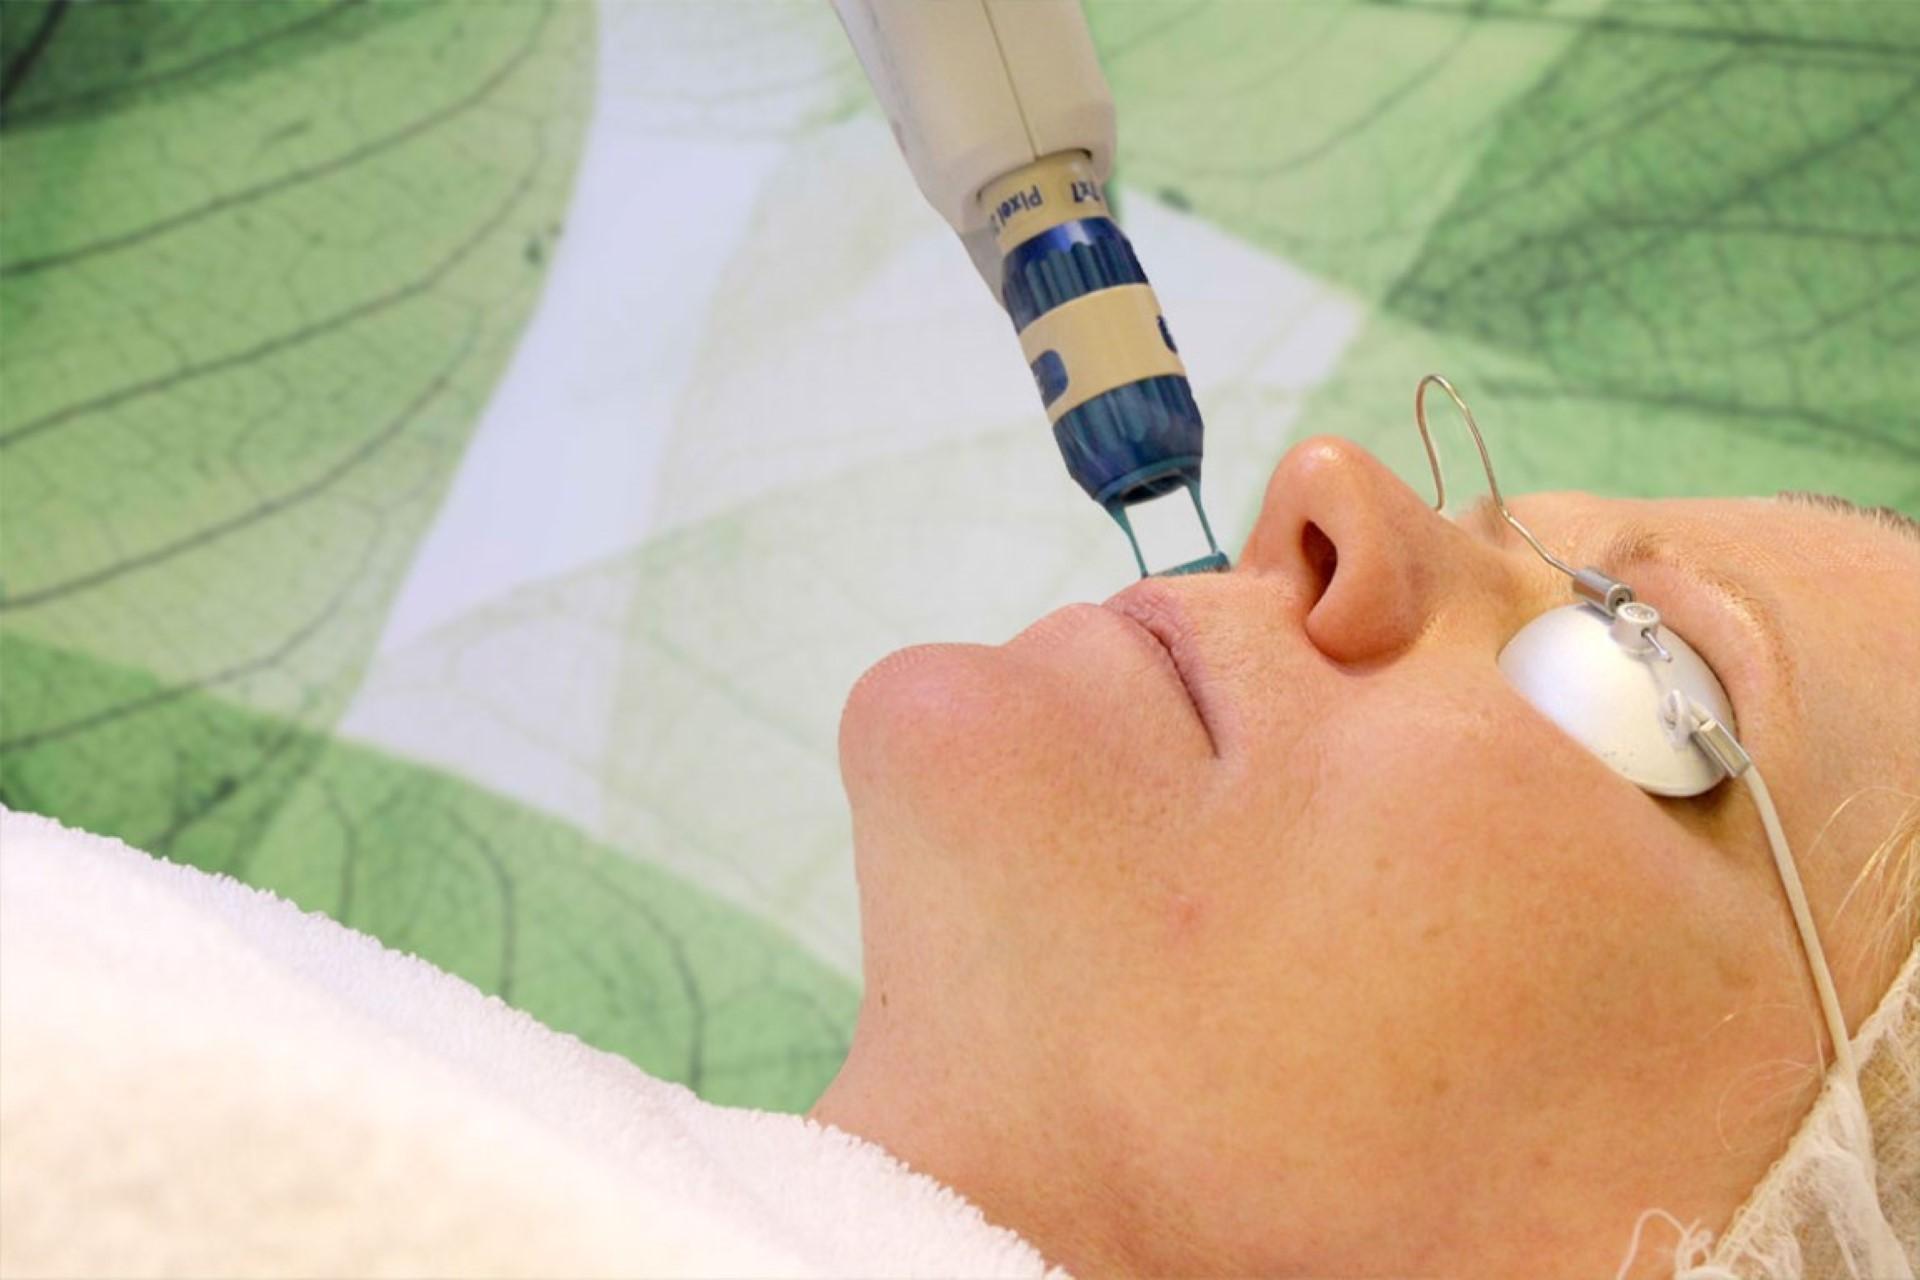 Acne littekens verwijderen? Laserkliniek Zwolle helpt.